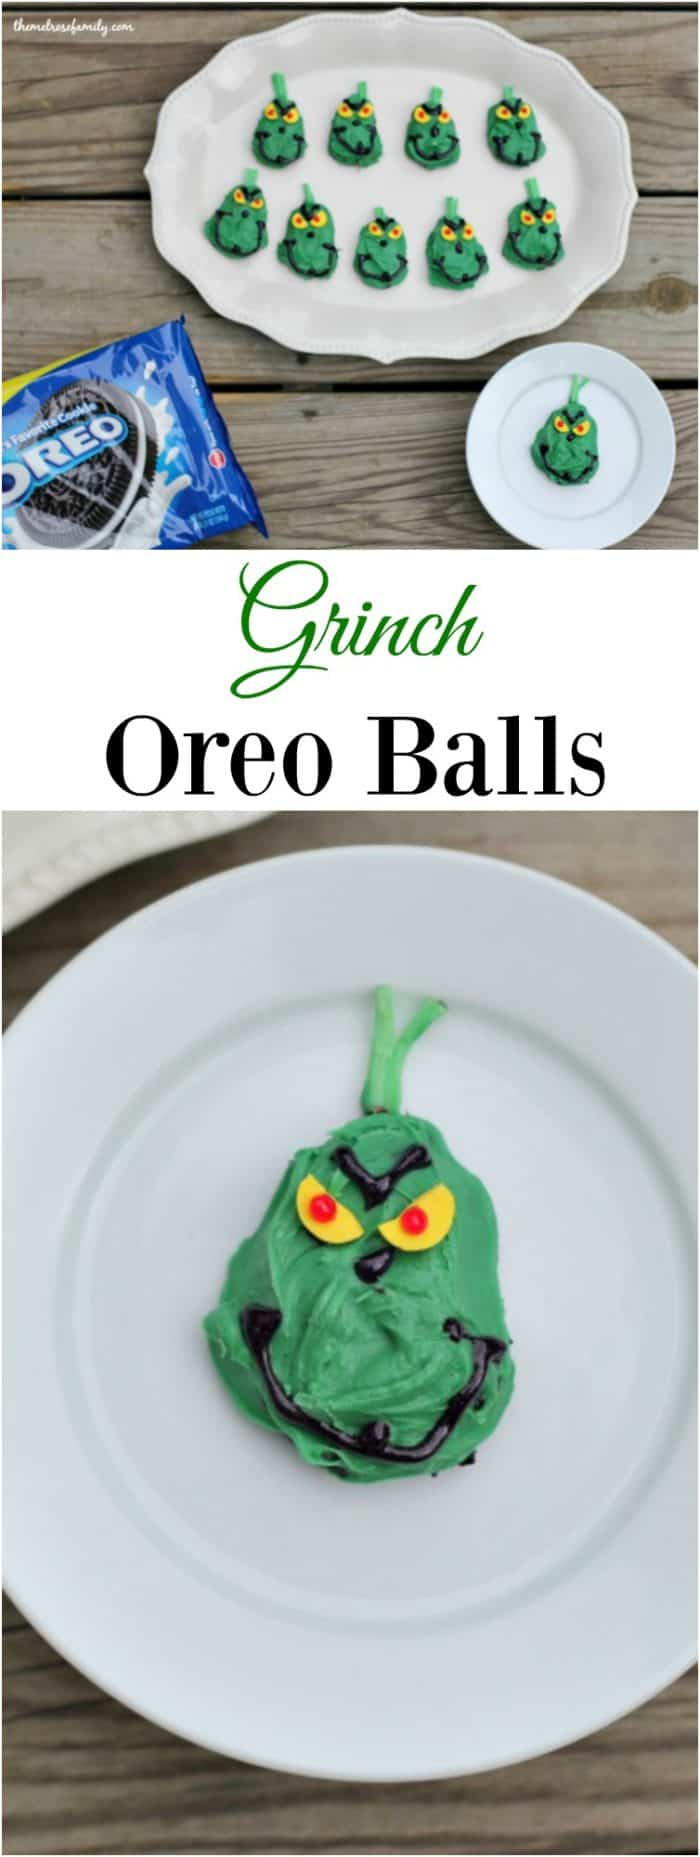 grinch-oreo-balls-pinterest